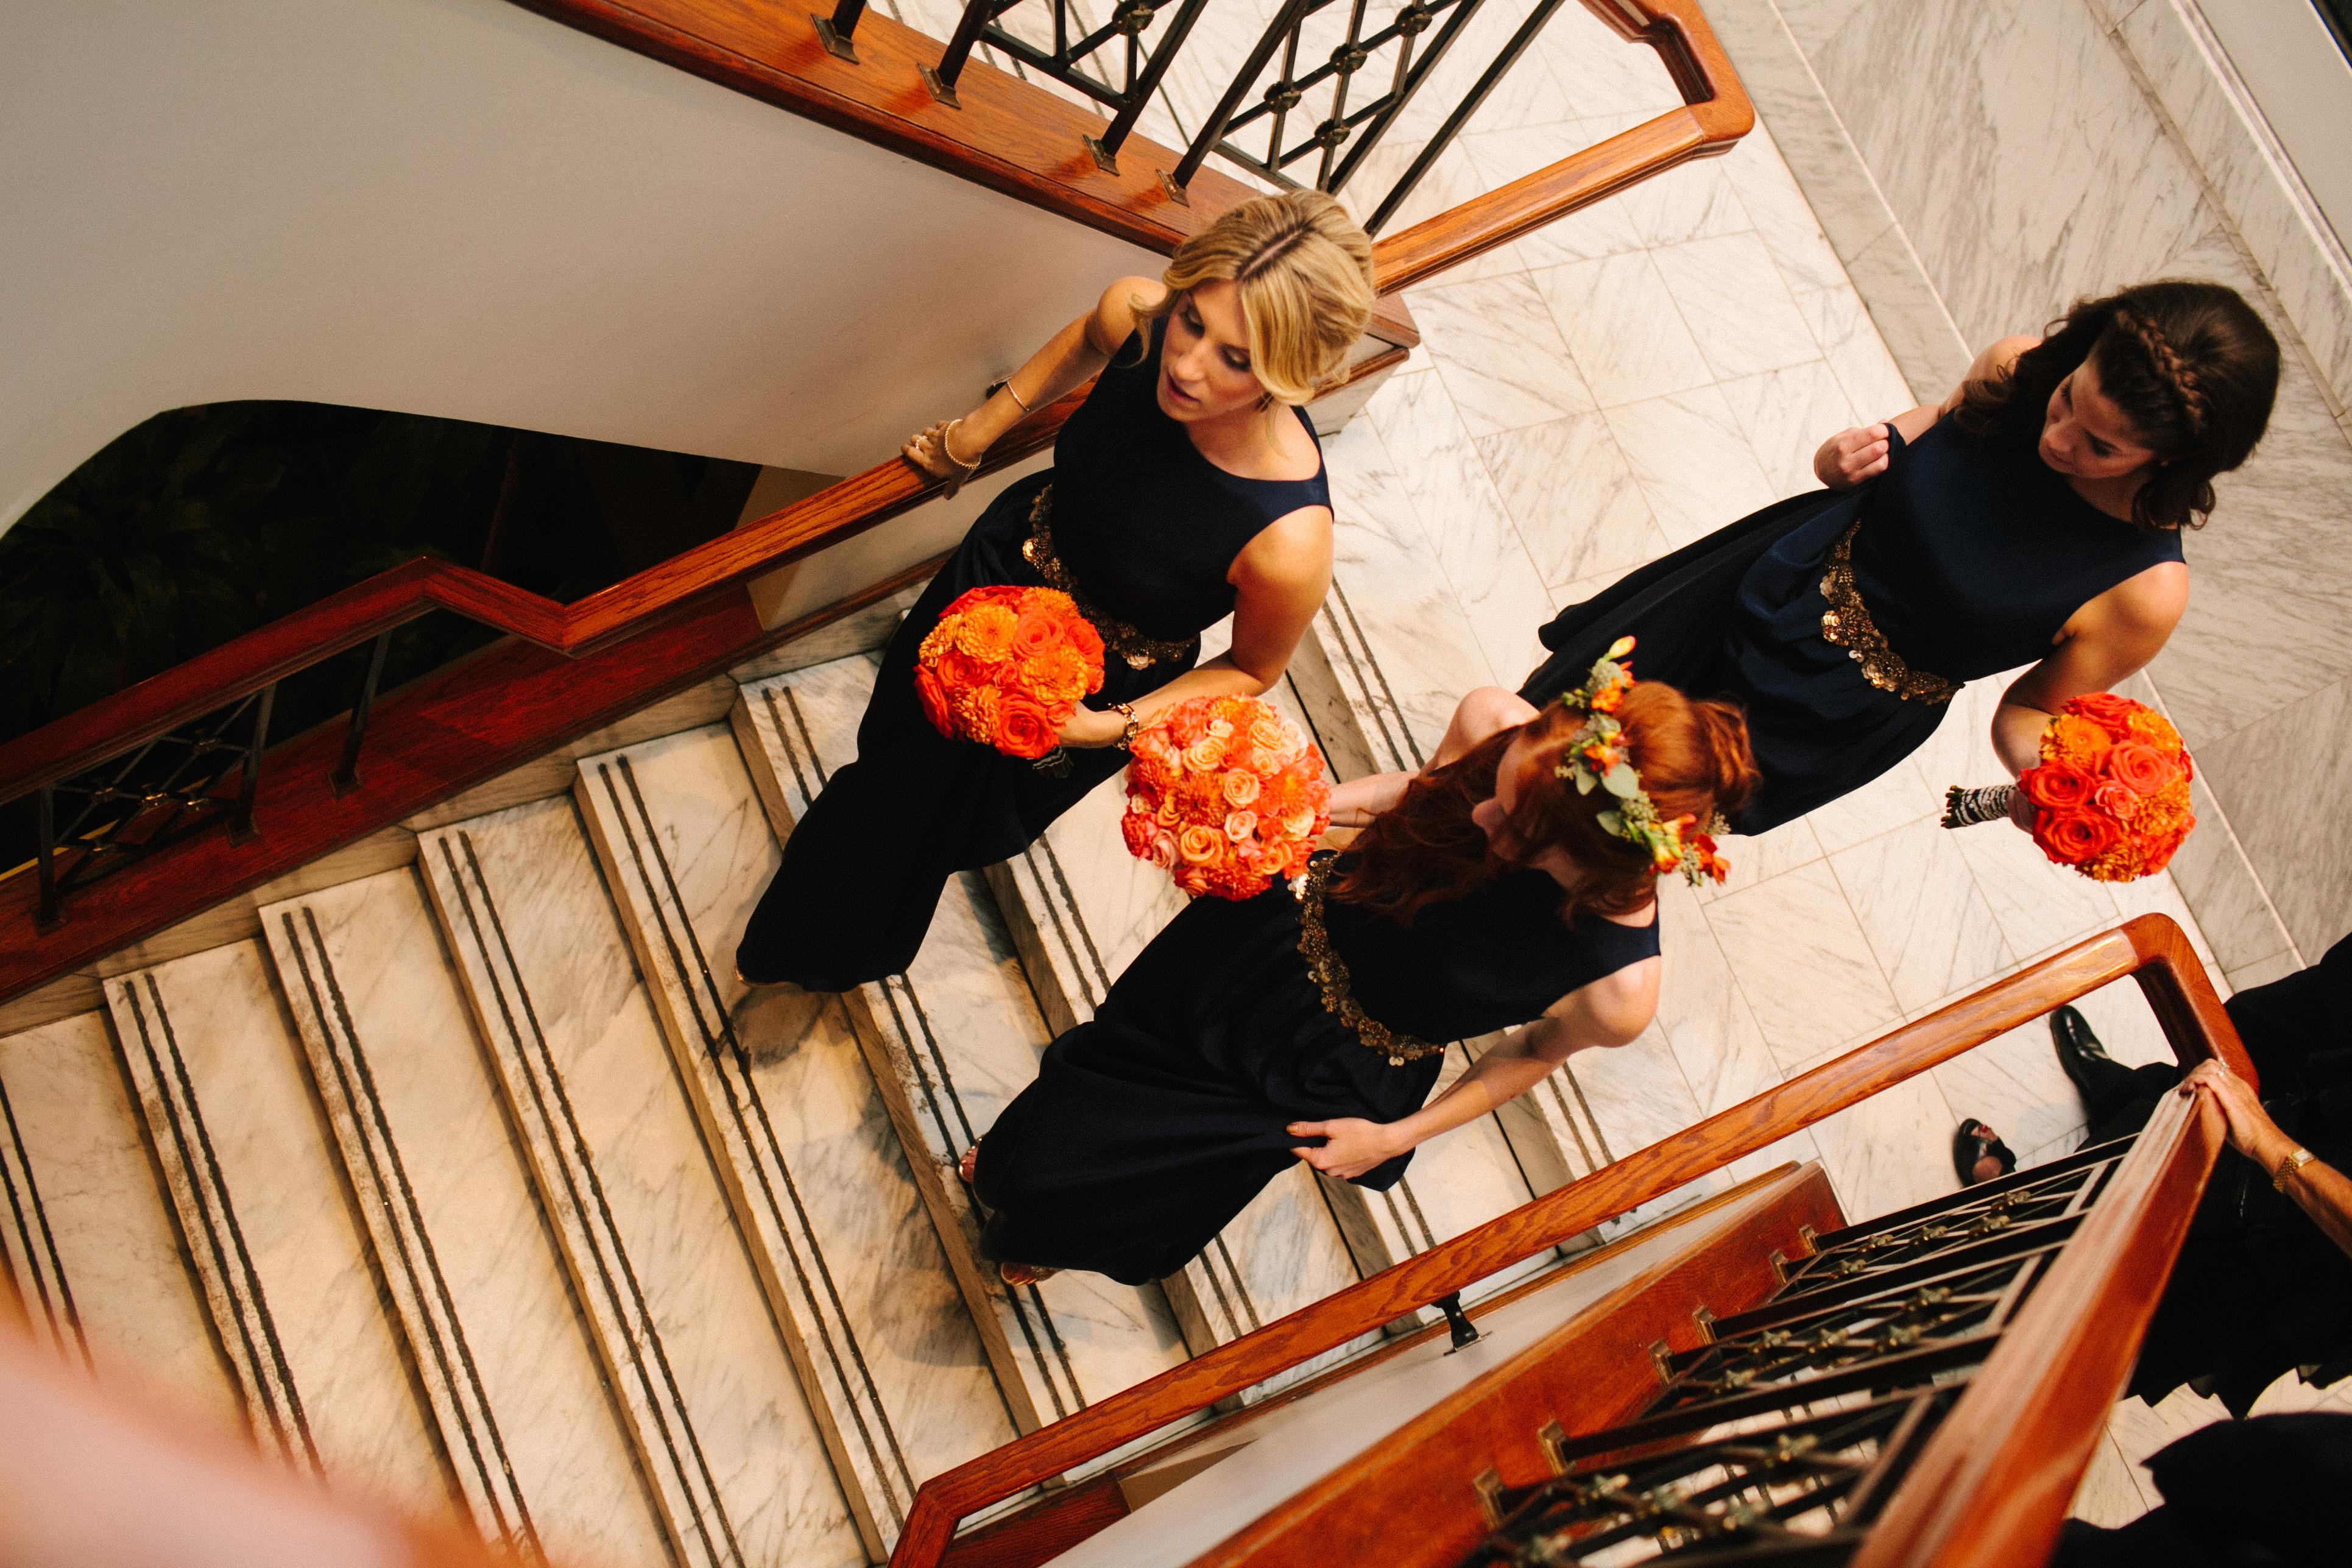 12-121_JacquelineDan_200952